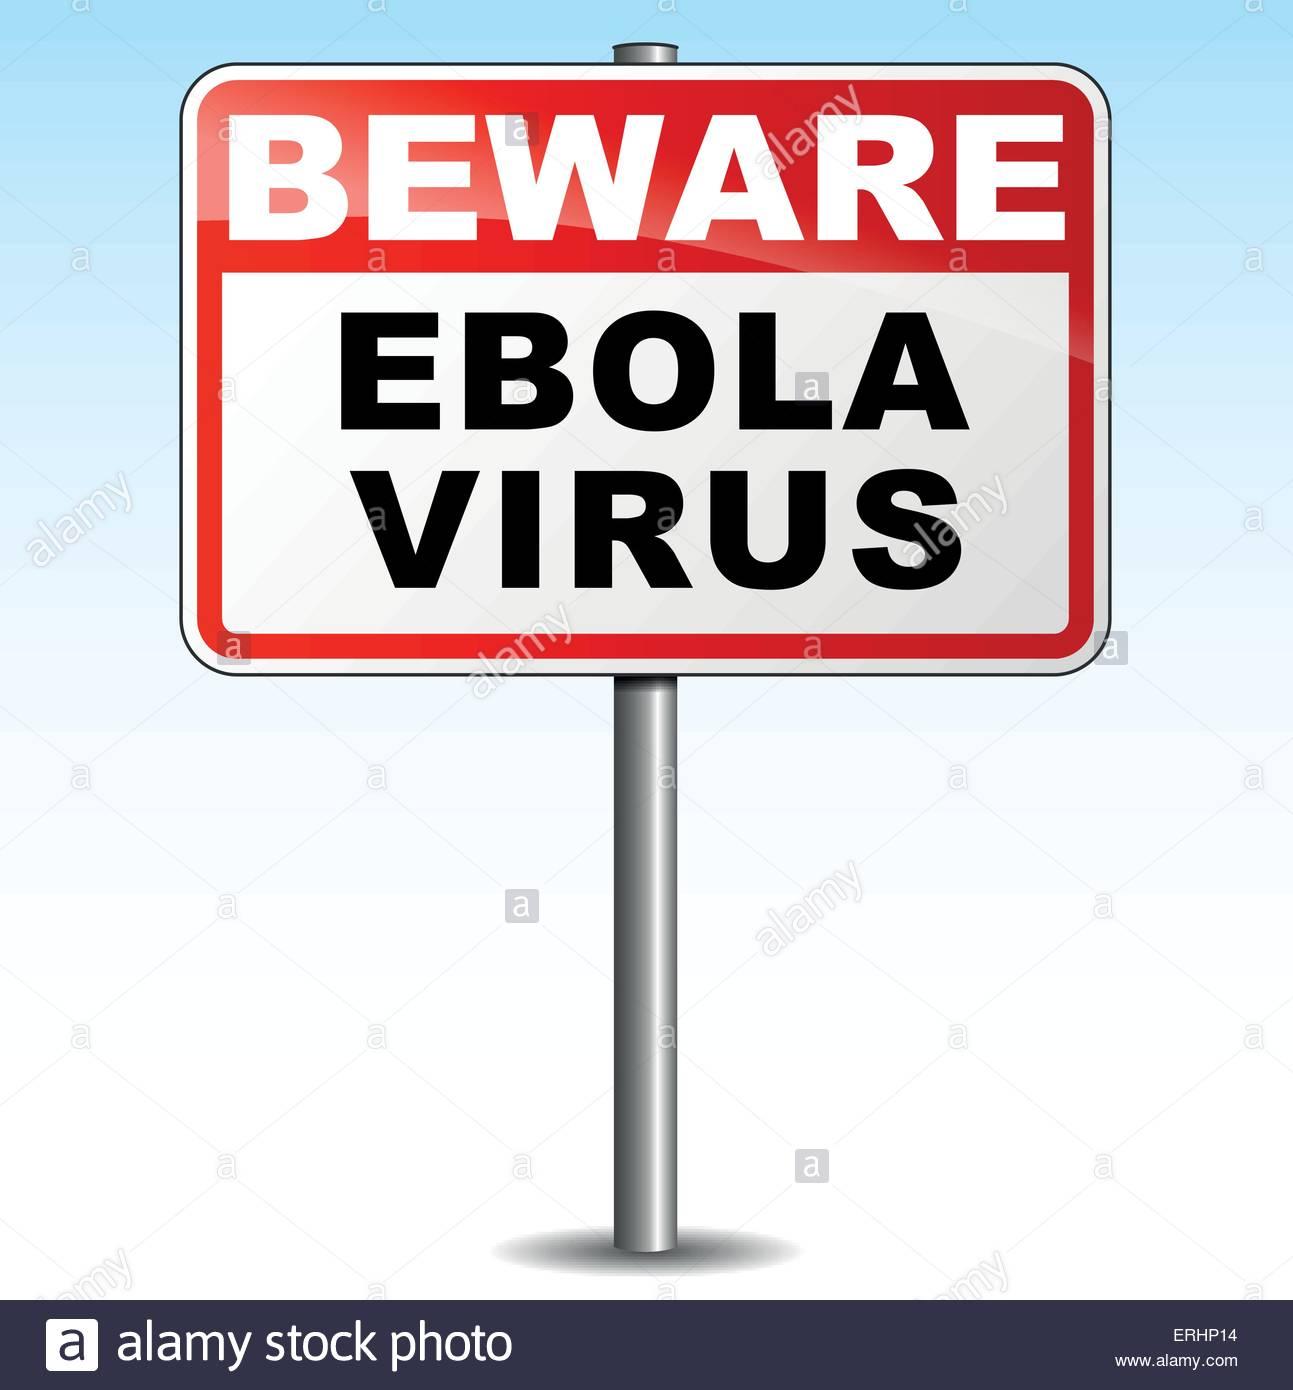 Vector illustration of ebola virus signpost on white background 1293x1390